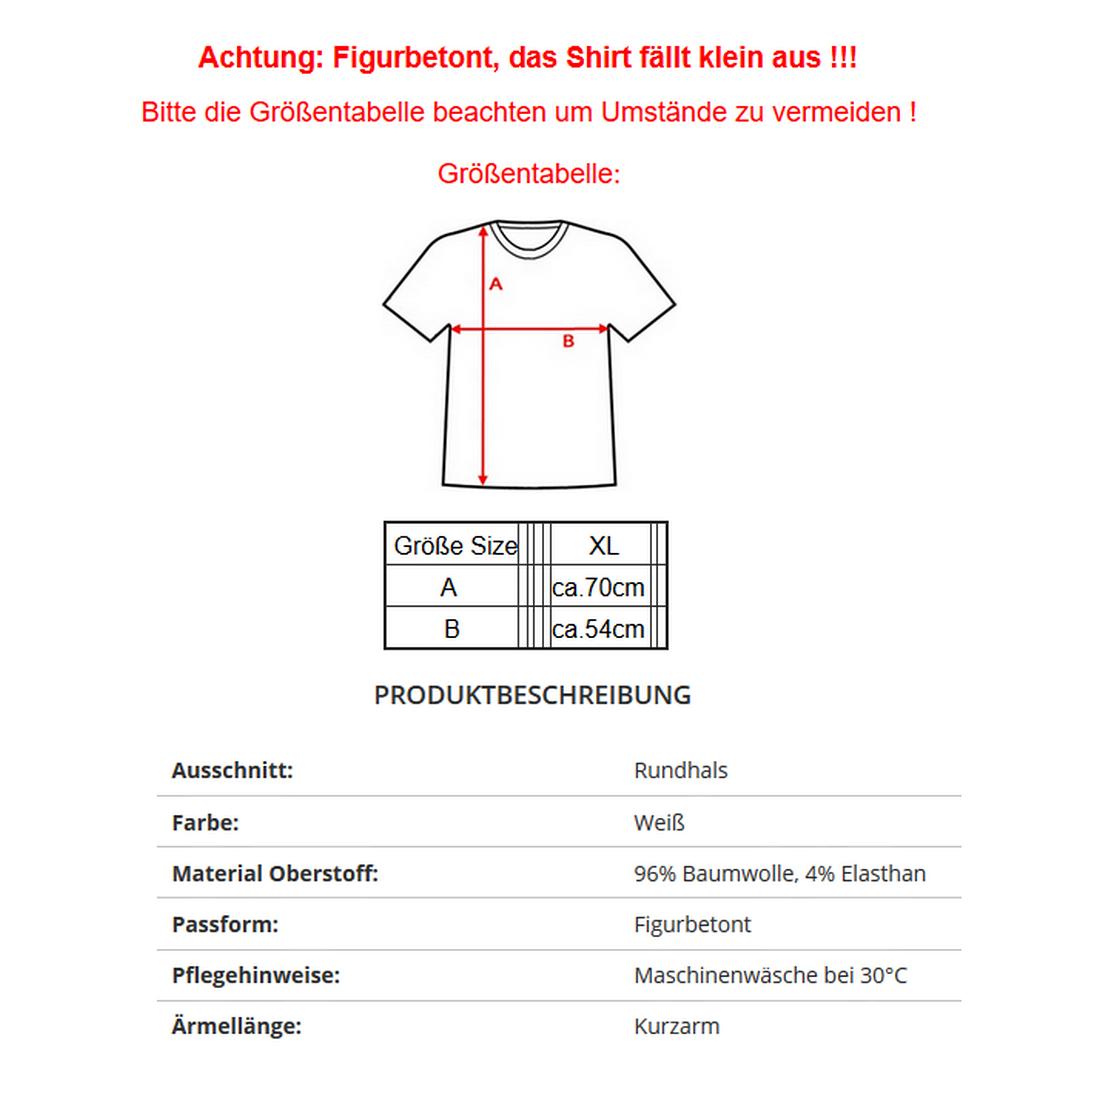 22a518a95f ... EMPORIO ARMANI EA7 3YPTL7 Herren Men T-Shirt Kurzarm Figurbetont Weiß  Click to zoom